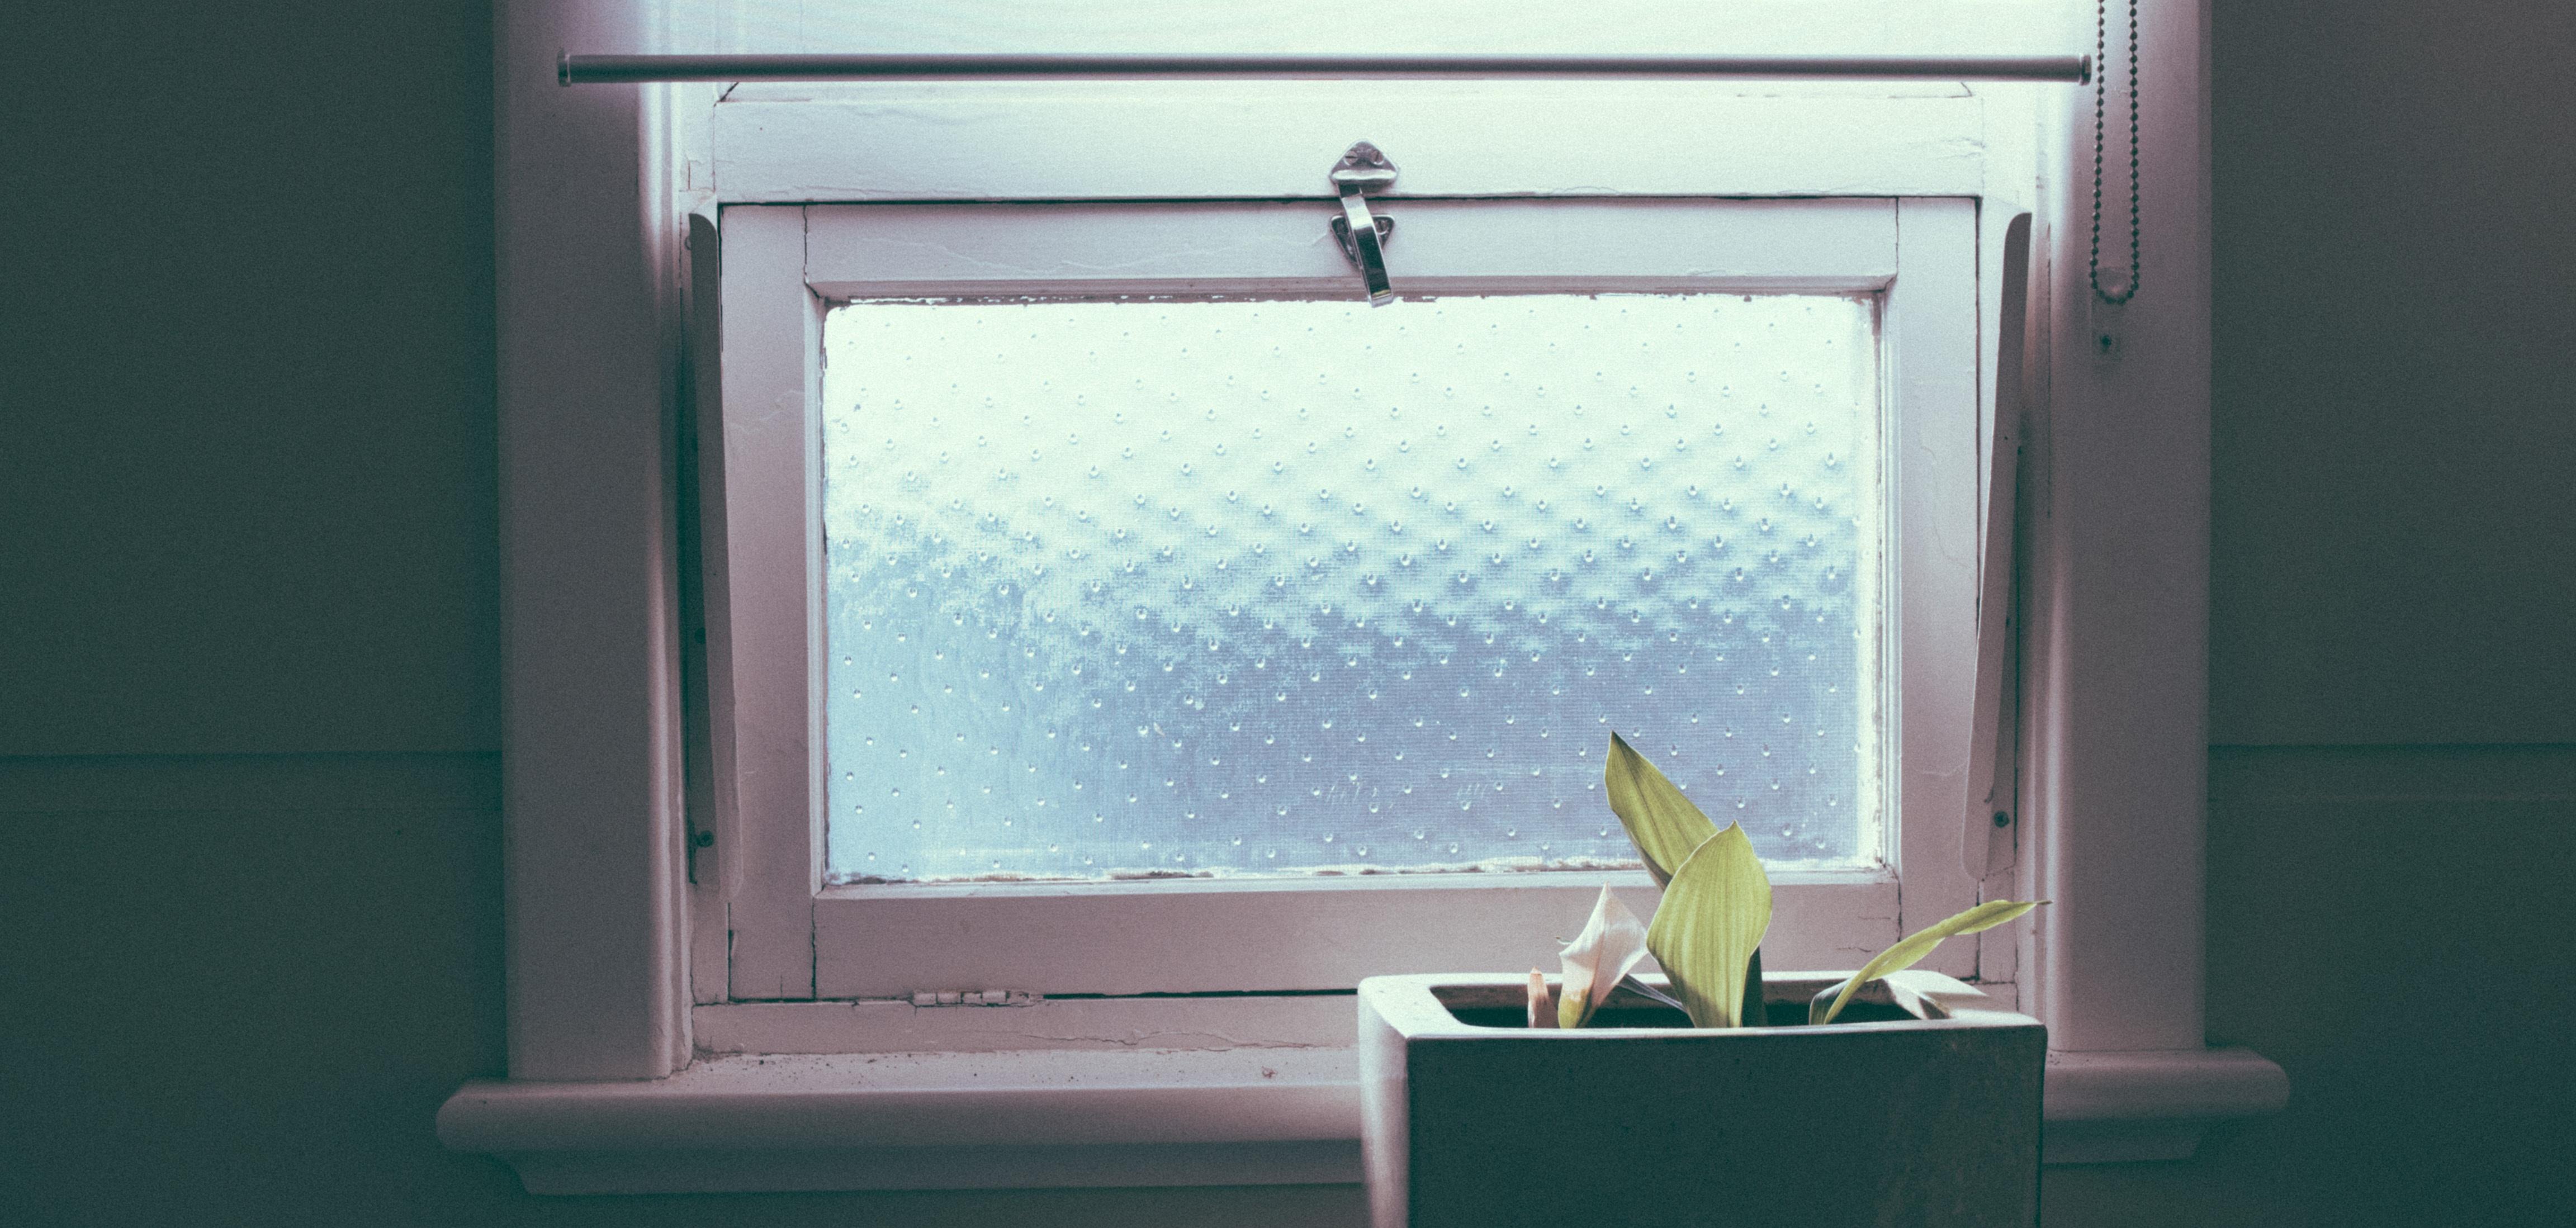 Gratuites lumi¨re blanc verre mur vert étag¨re bleu